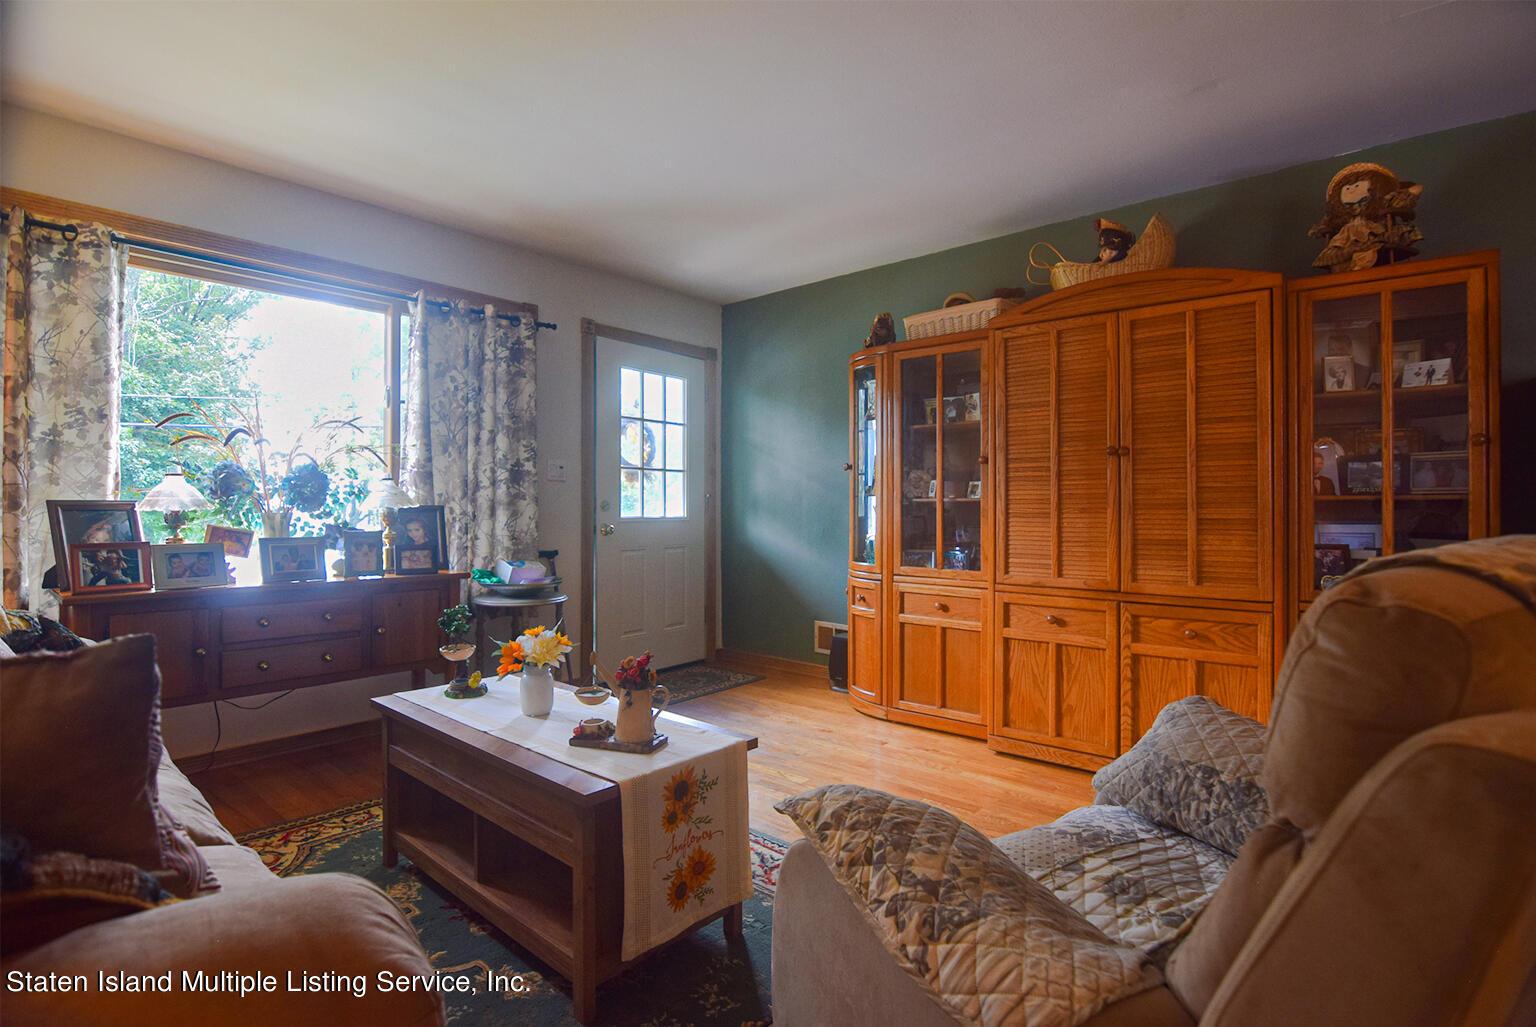 Single Family - Semi-Attached 524 Tennyson Drive  Staten Island, NY 10312, MLS-1149452-2